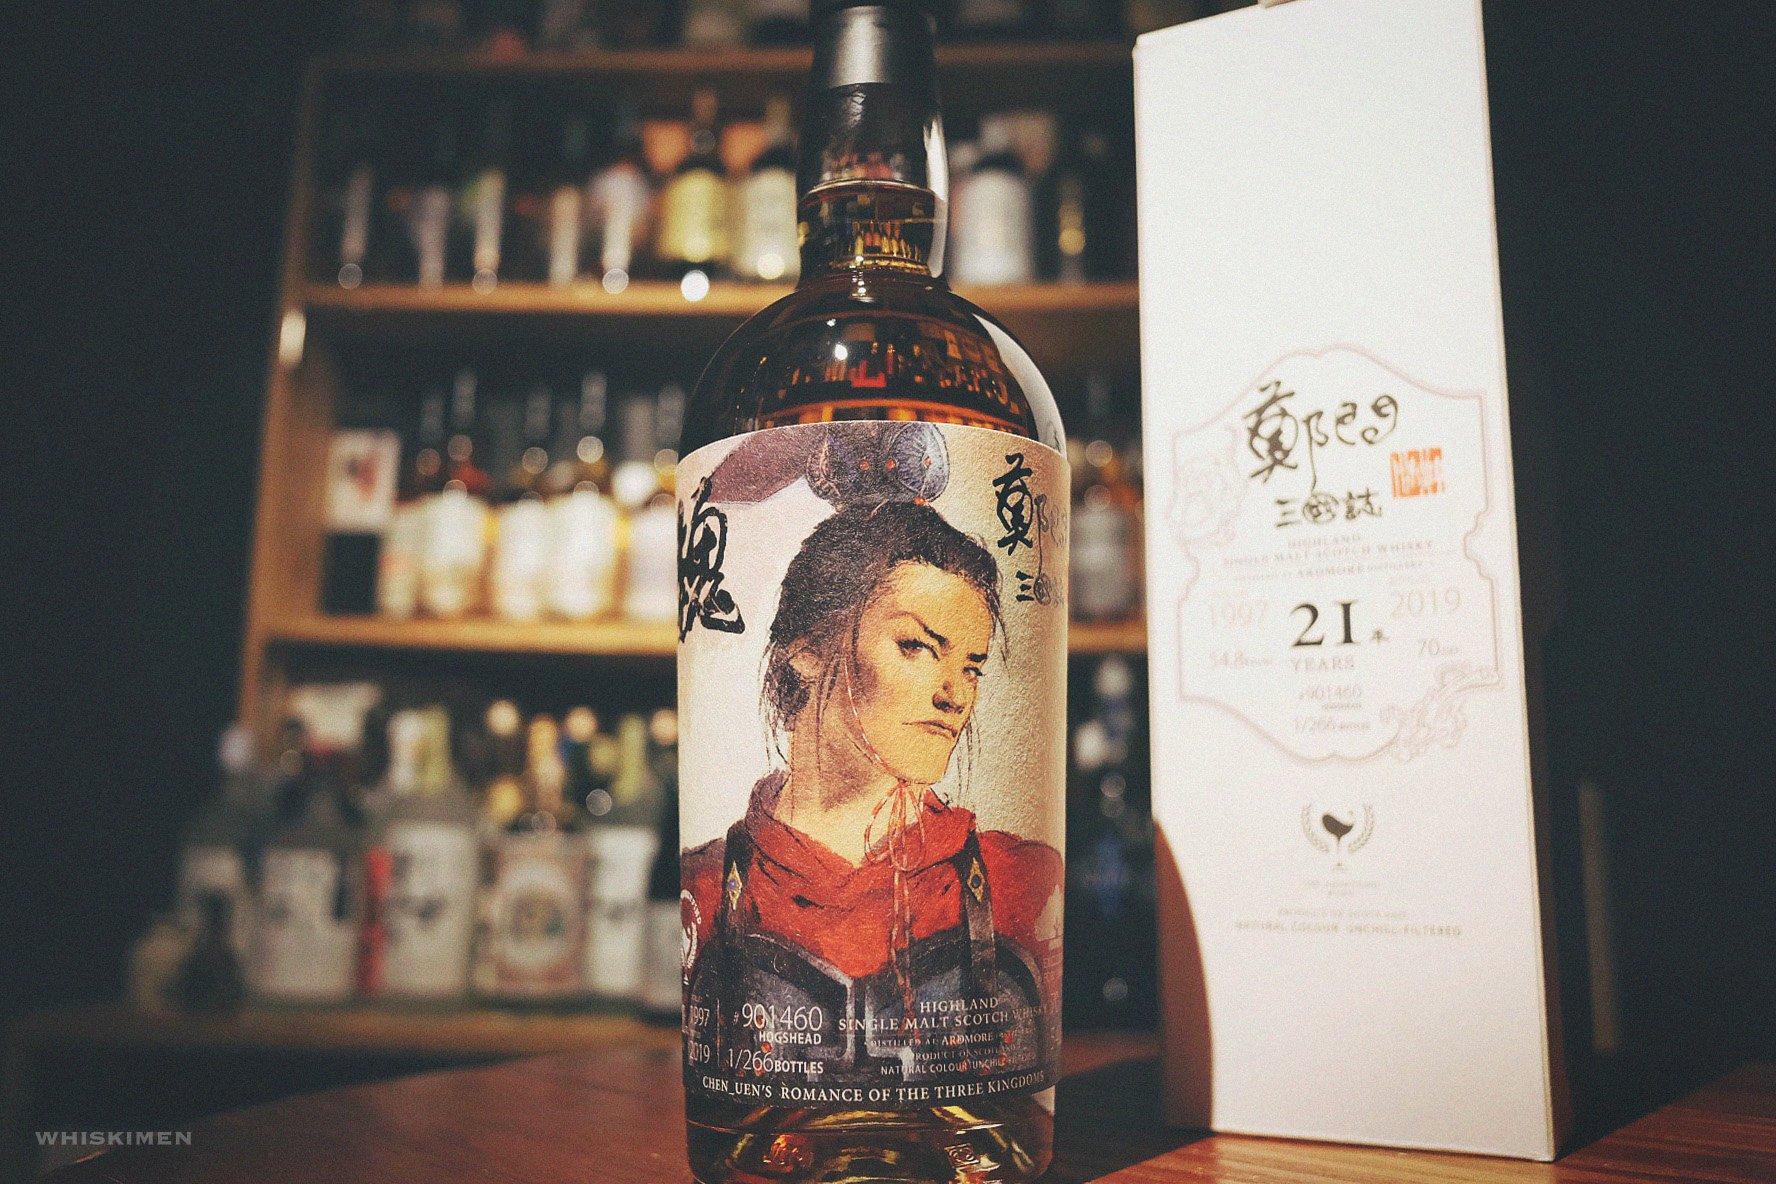 Whiskyfind 鄭問三國誌Ardmore 1997 21 Year Old Single Malt Whisky 曹丕